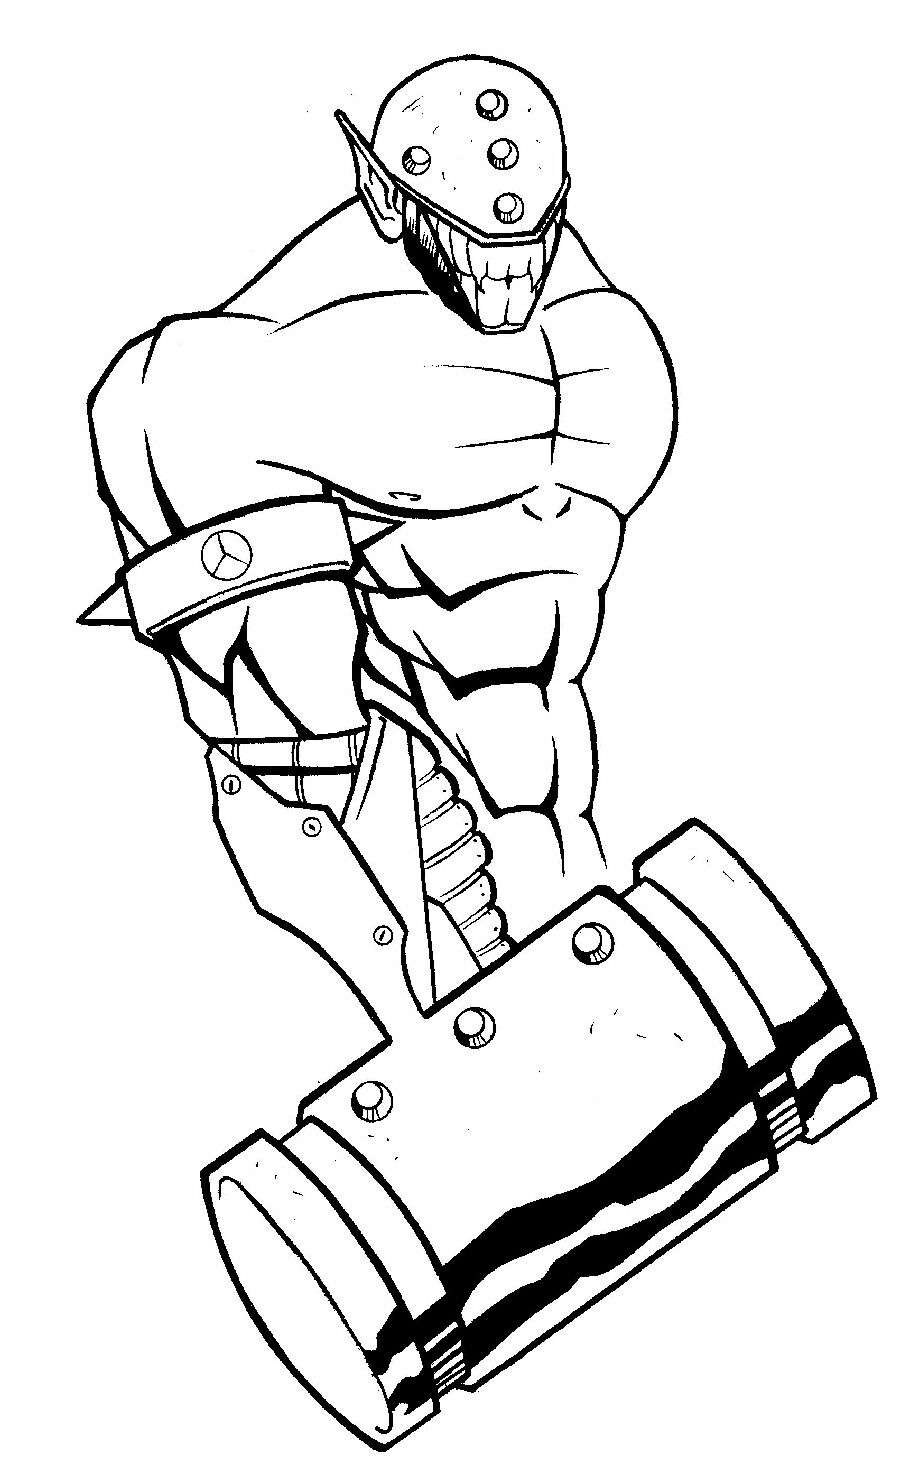 Stock Art Hammer Fist Hermadolph Stock Art Drivethrurpg Com